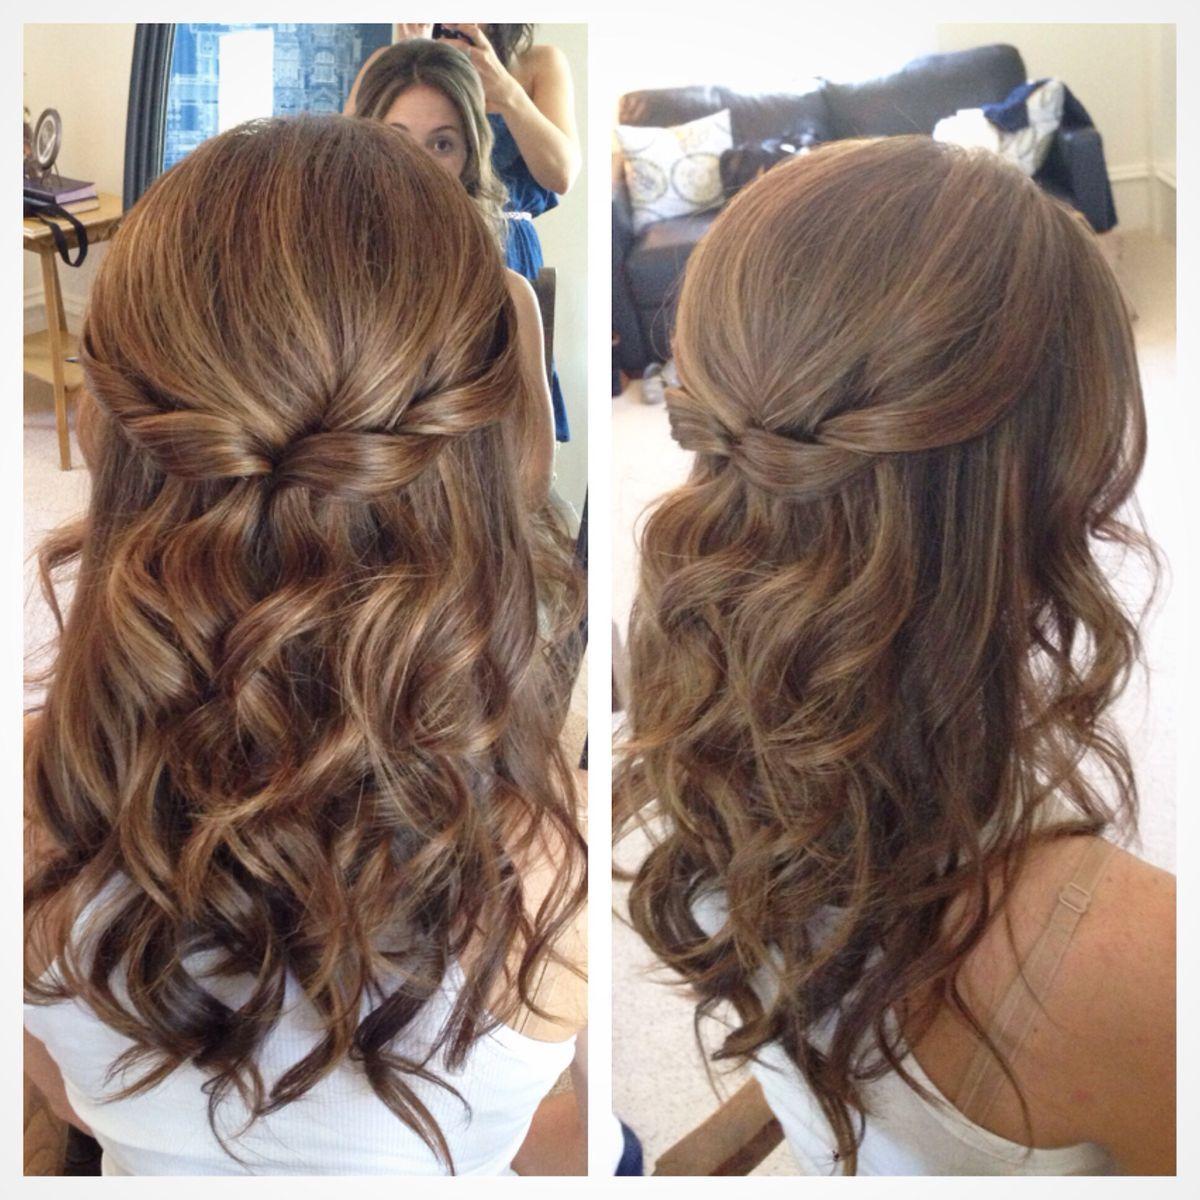 Simple wedding hairstyles best photos wedding hairstyles